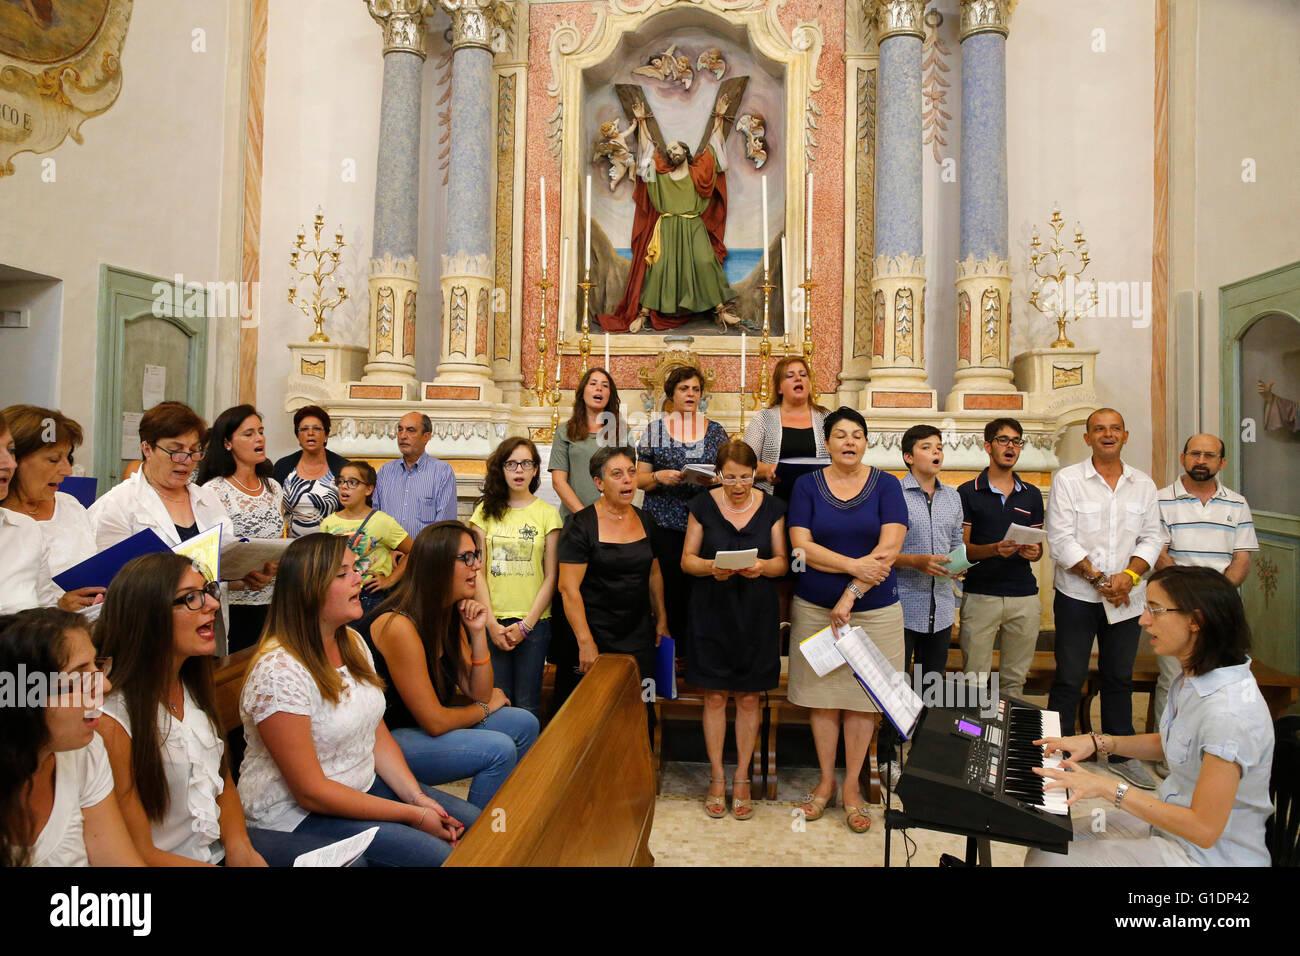 Mass in an Italian catholic church. Choir. Tricase. Italy ...